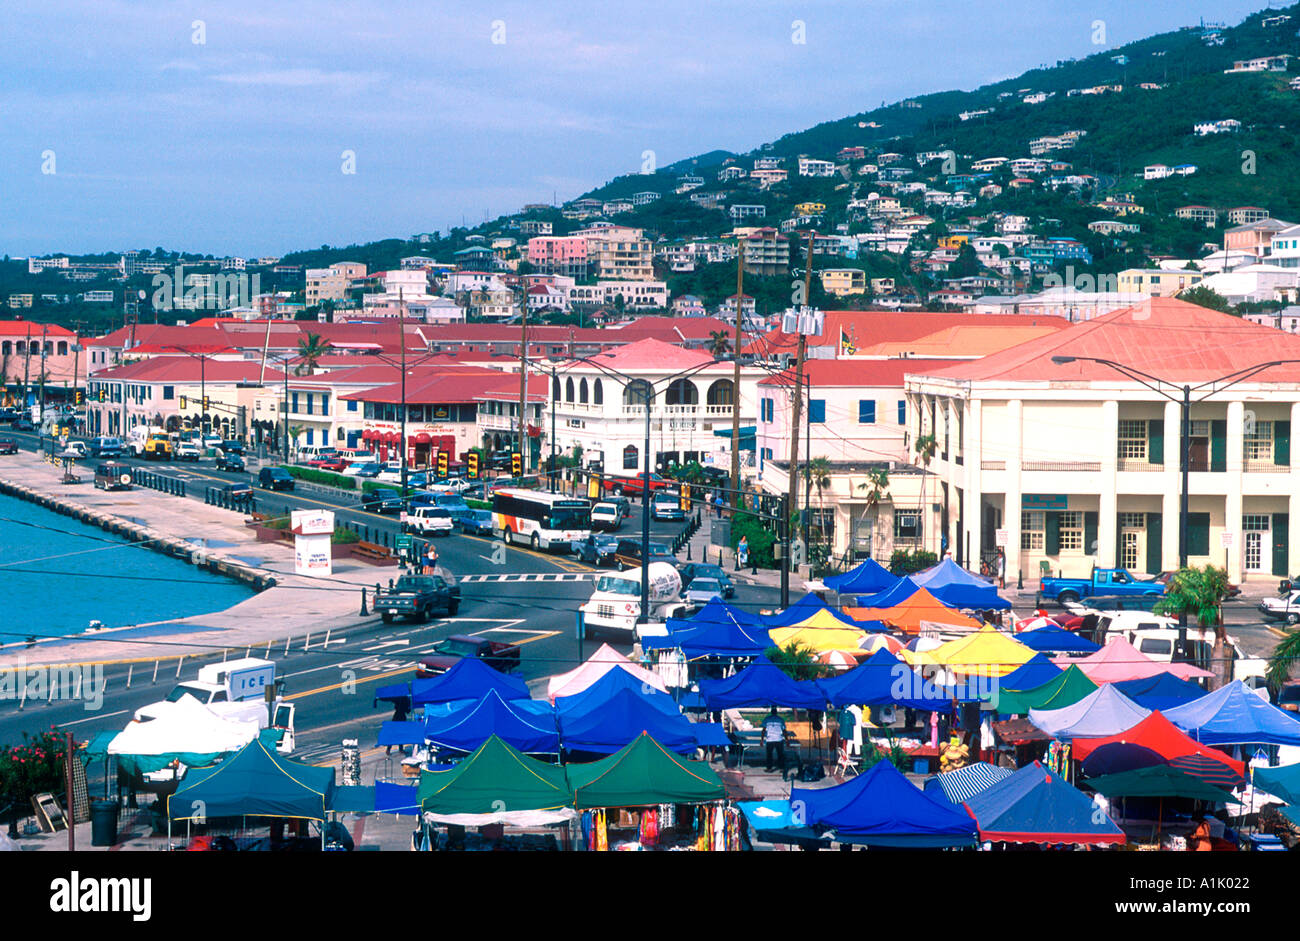 Capital Of British Virgin Islands